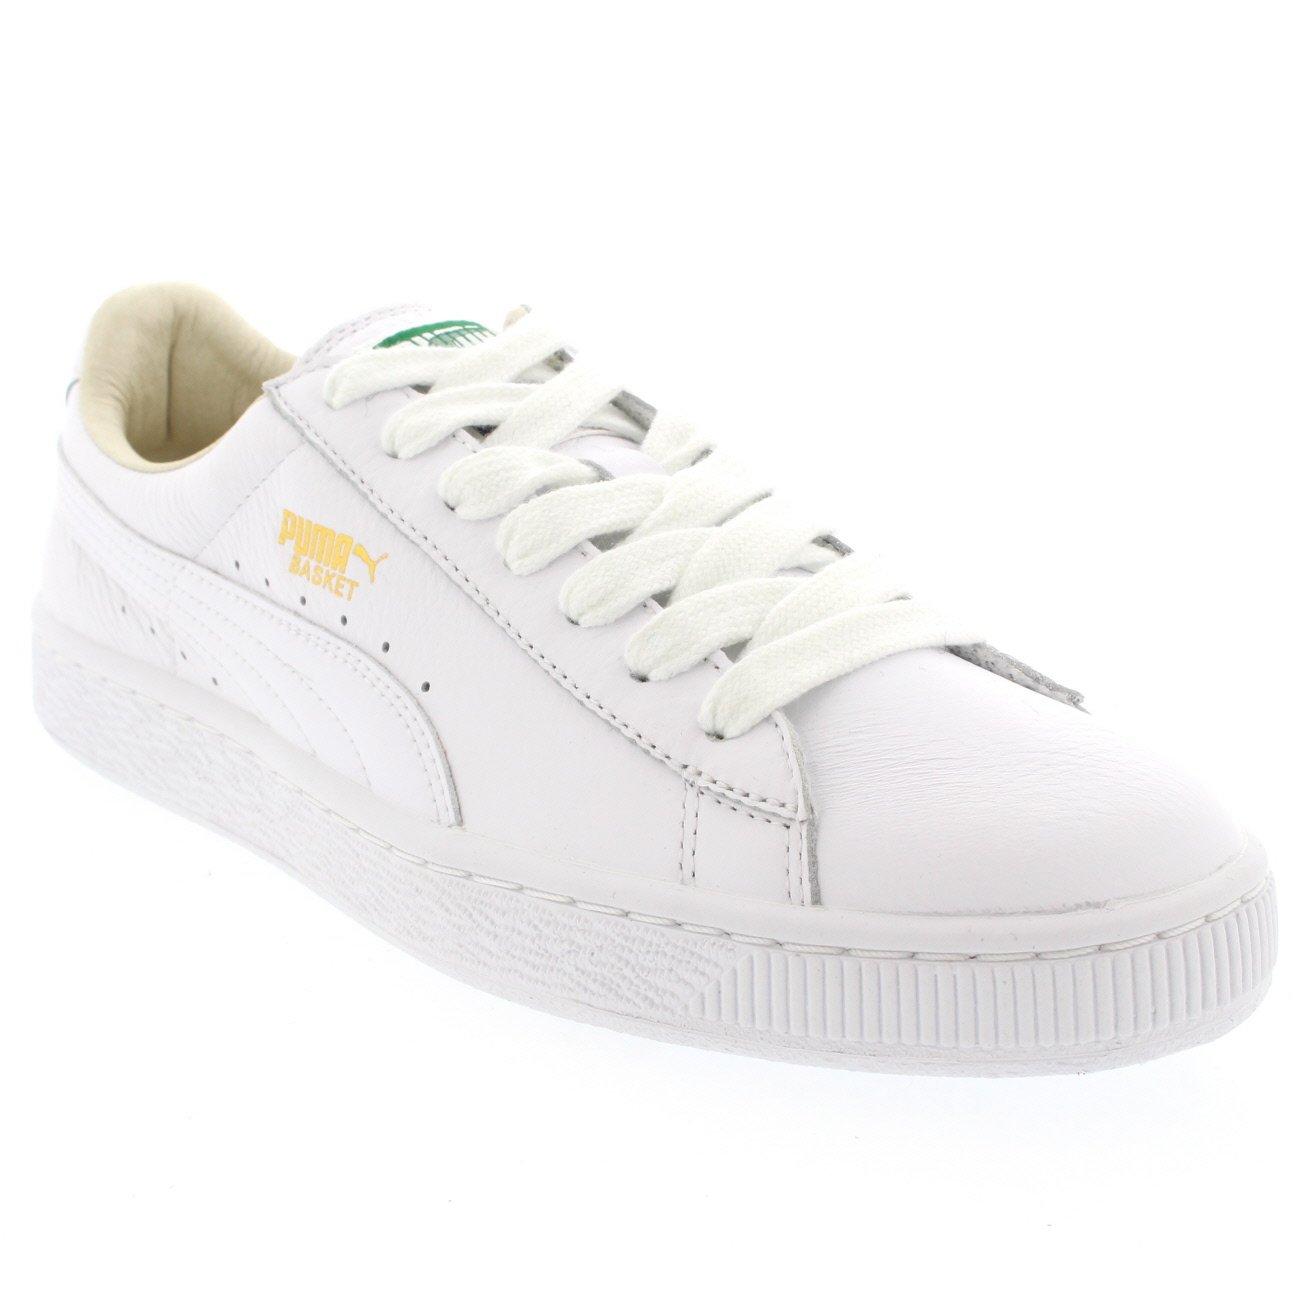 huge selection of 5eb85 8e1d8 Amazon.com | PUMA Mens Basket Classic Leather Low Cut White ...